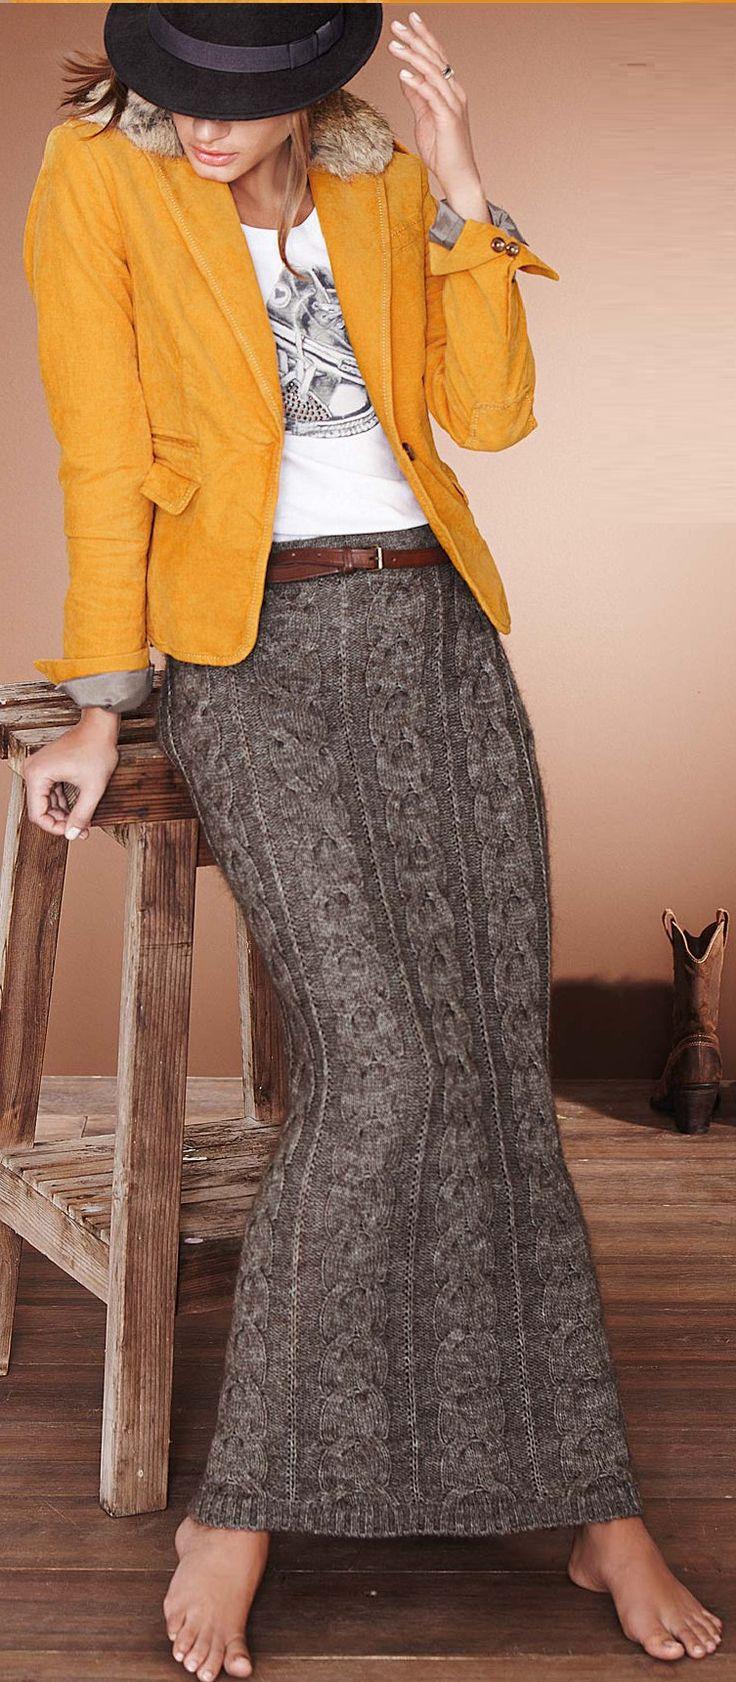 knittet sweaterdress : Foto